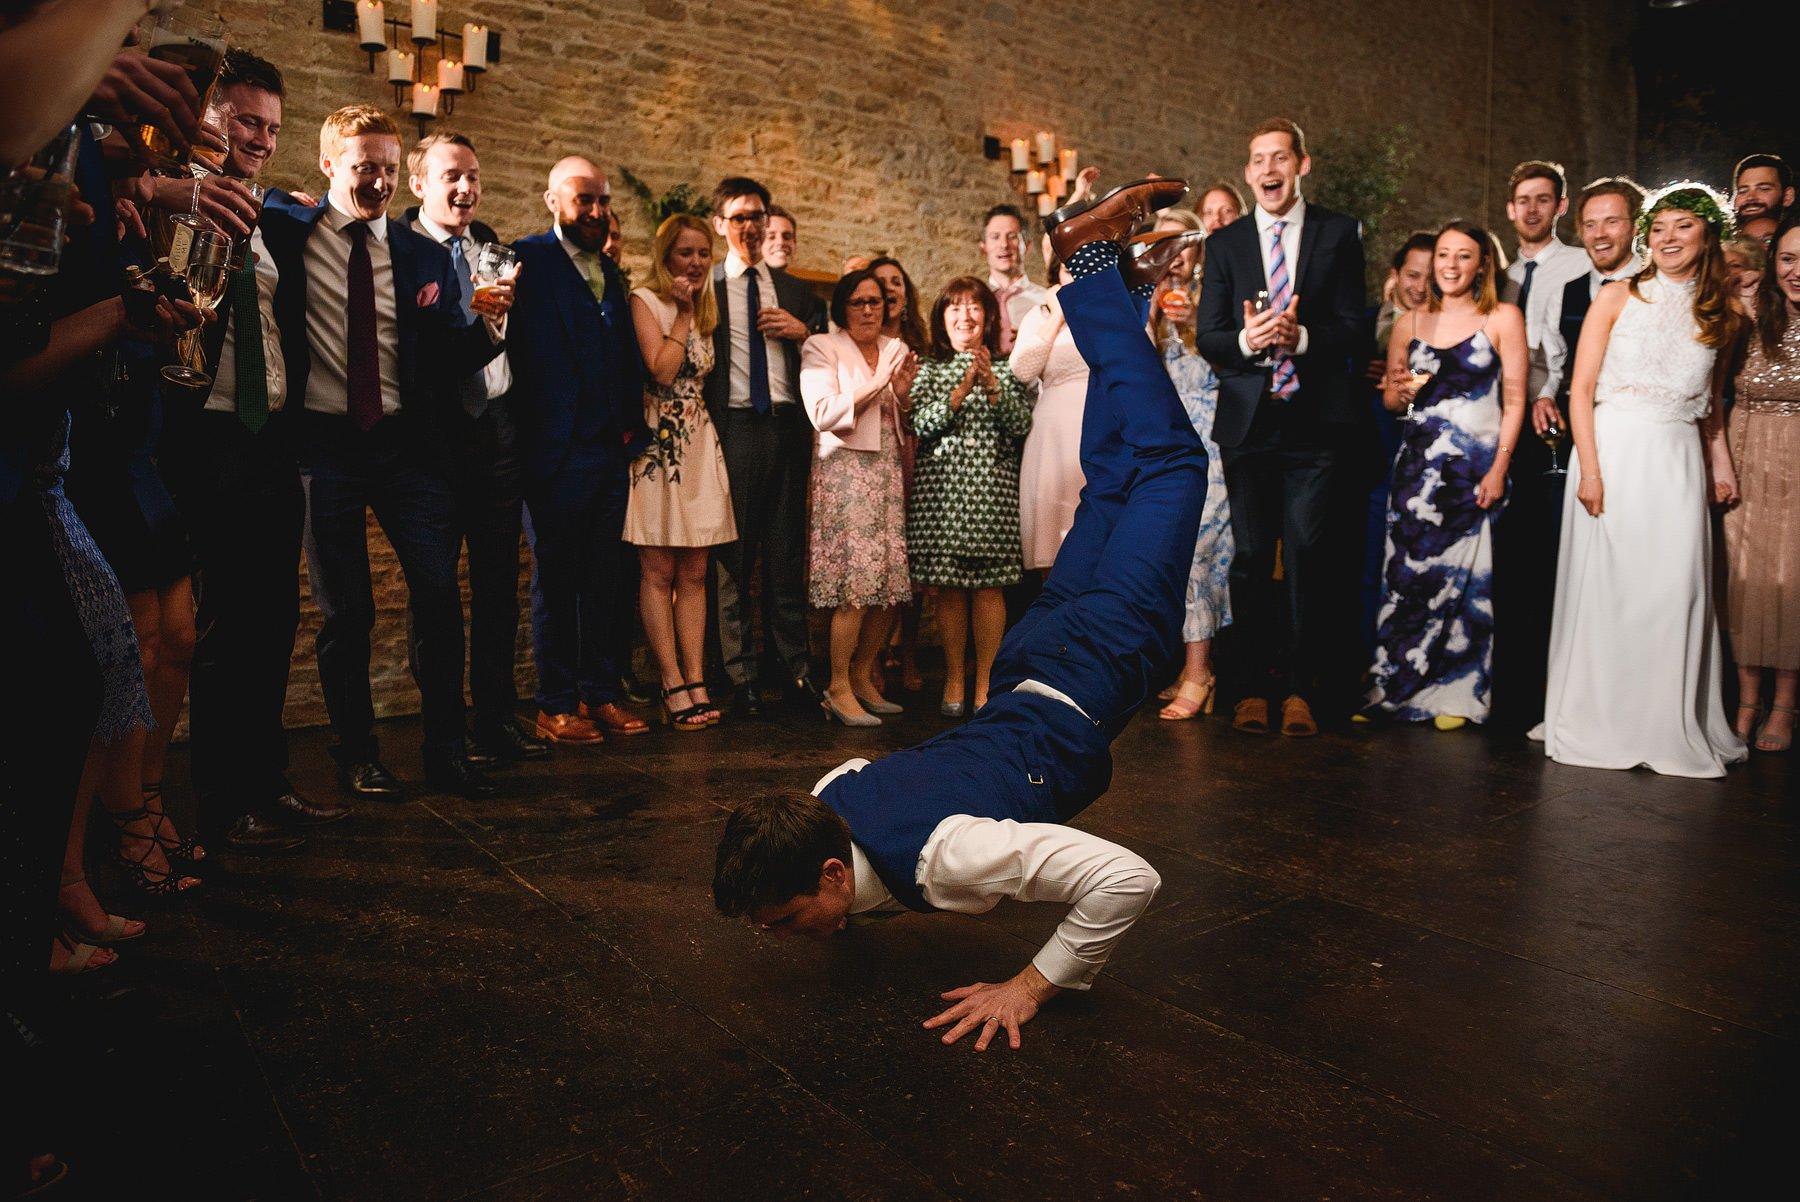 Rustic Stled Wedding DJ